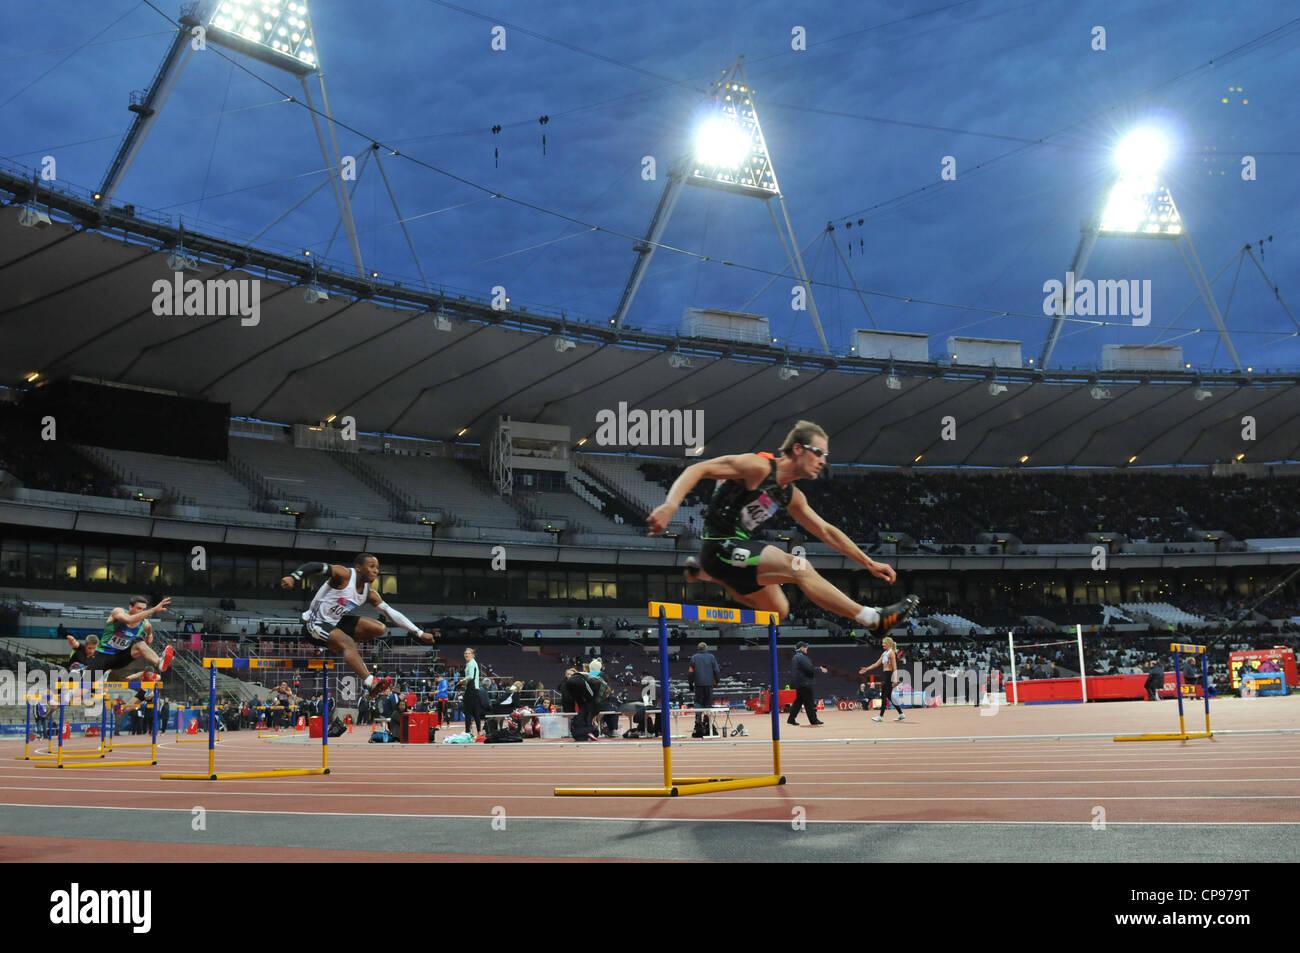 Olympic 2012 Athletics Stadium, London, UK. Mens 400m hurdles at the BUCS VISA Outdoor Athletics Championships. - Stock Image